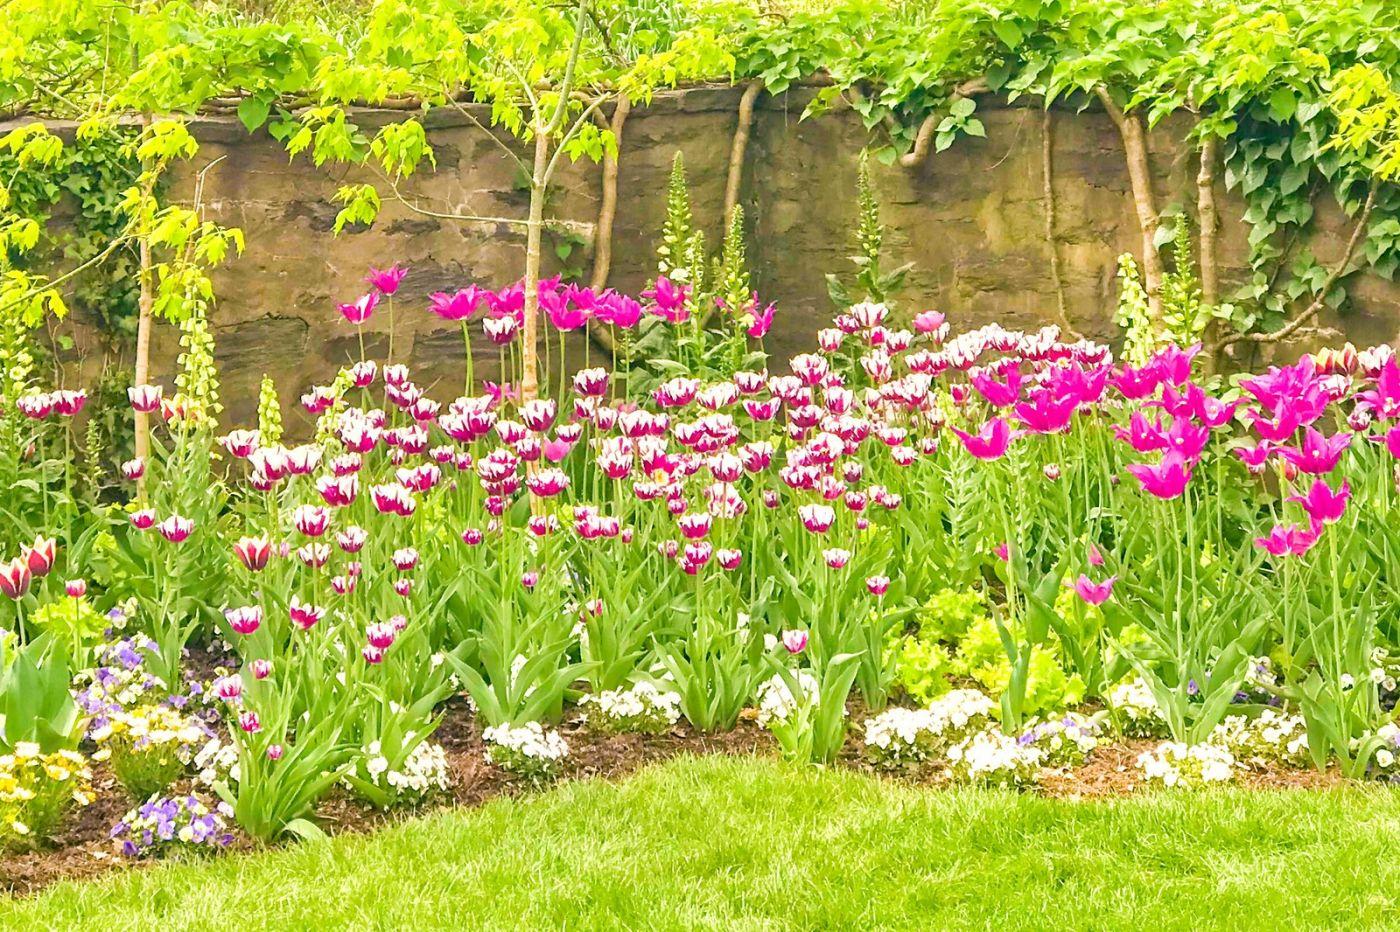 Chanticleer花园,点亮心灵_图1-14